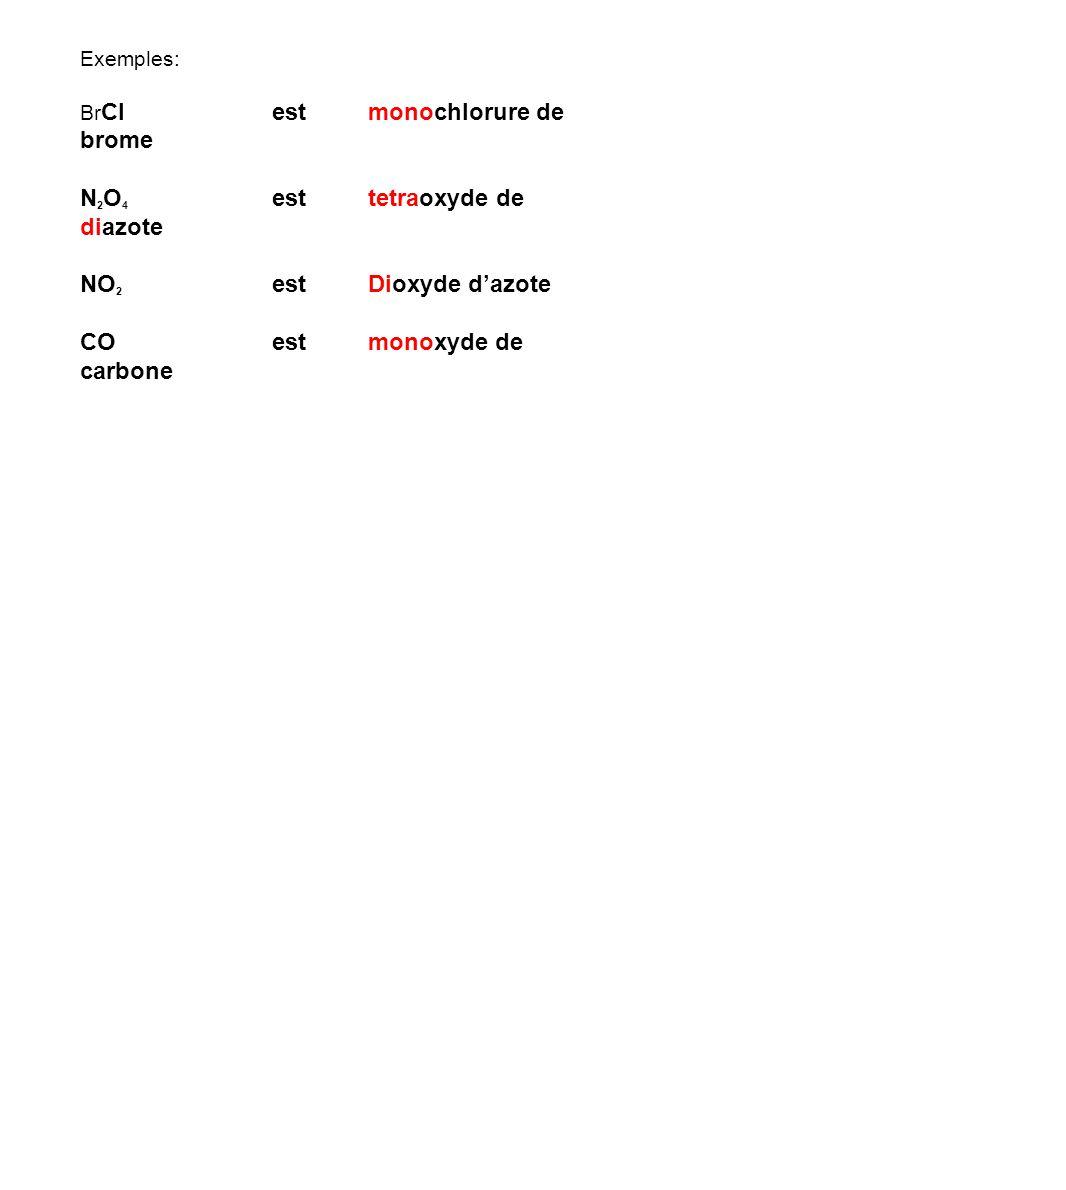 Exemples: Br Clestmonochlorure de brome N 2 O 4 est tetraoxyde de diazote NO 2 estDioxyde d'azote COest monoxyde de carbone